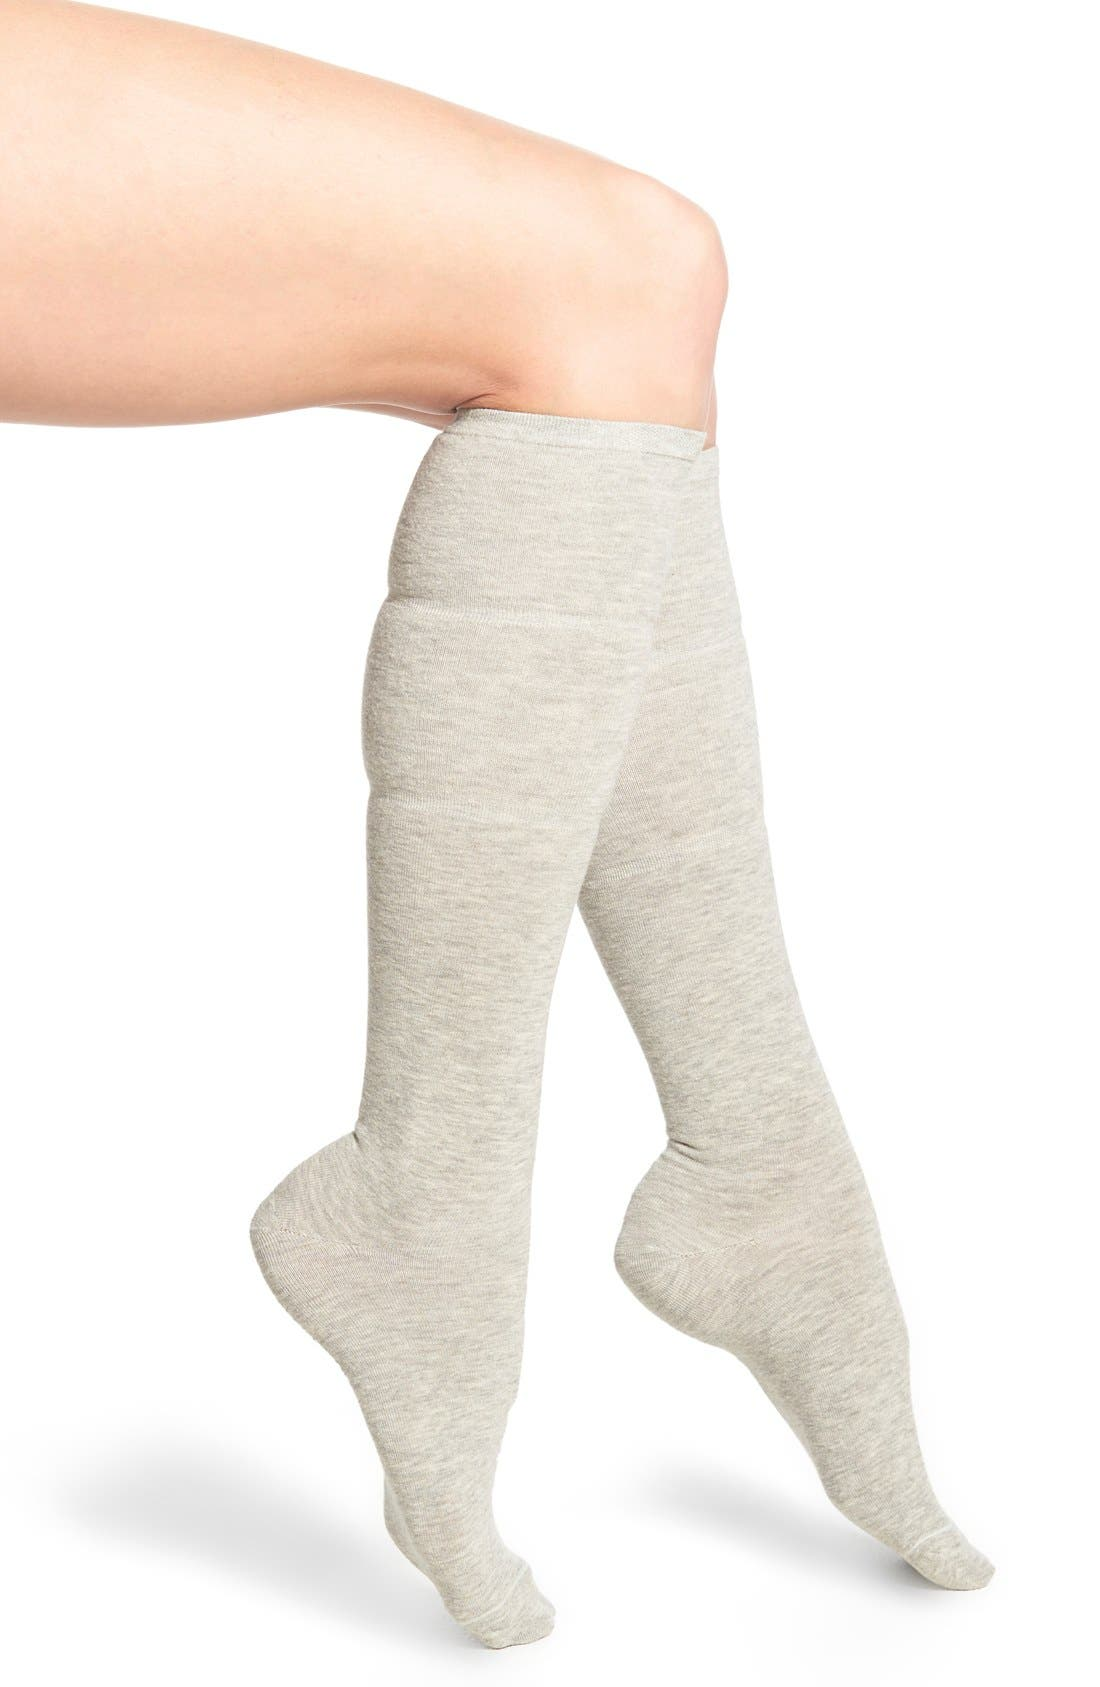 Main Image - Yummie by Heather Thomson Gathered Knee High Socks